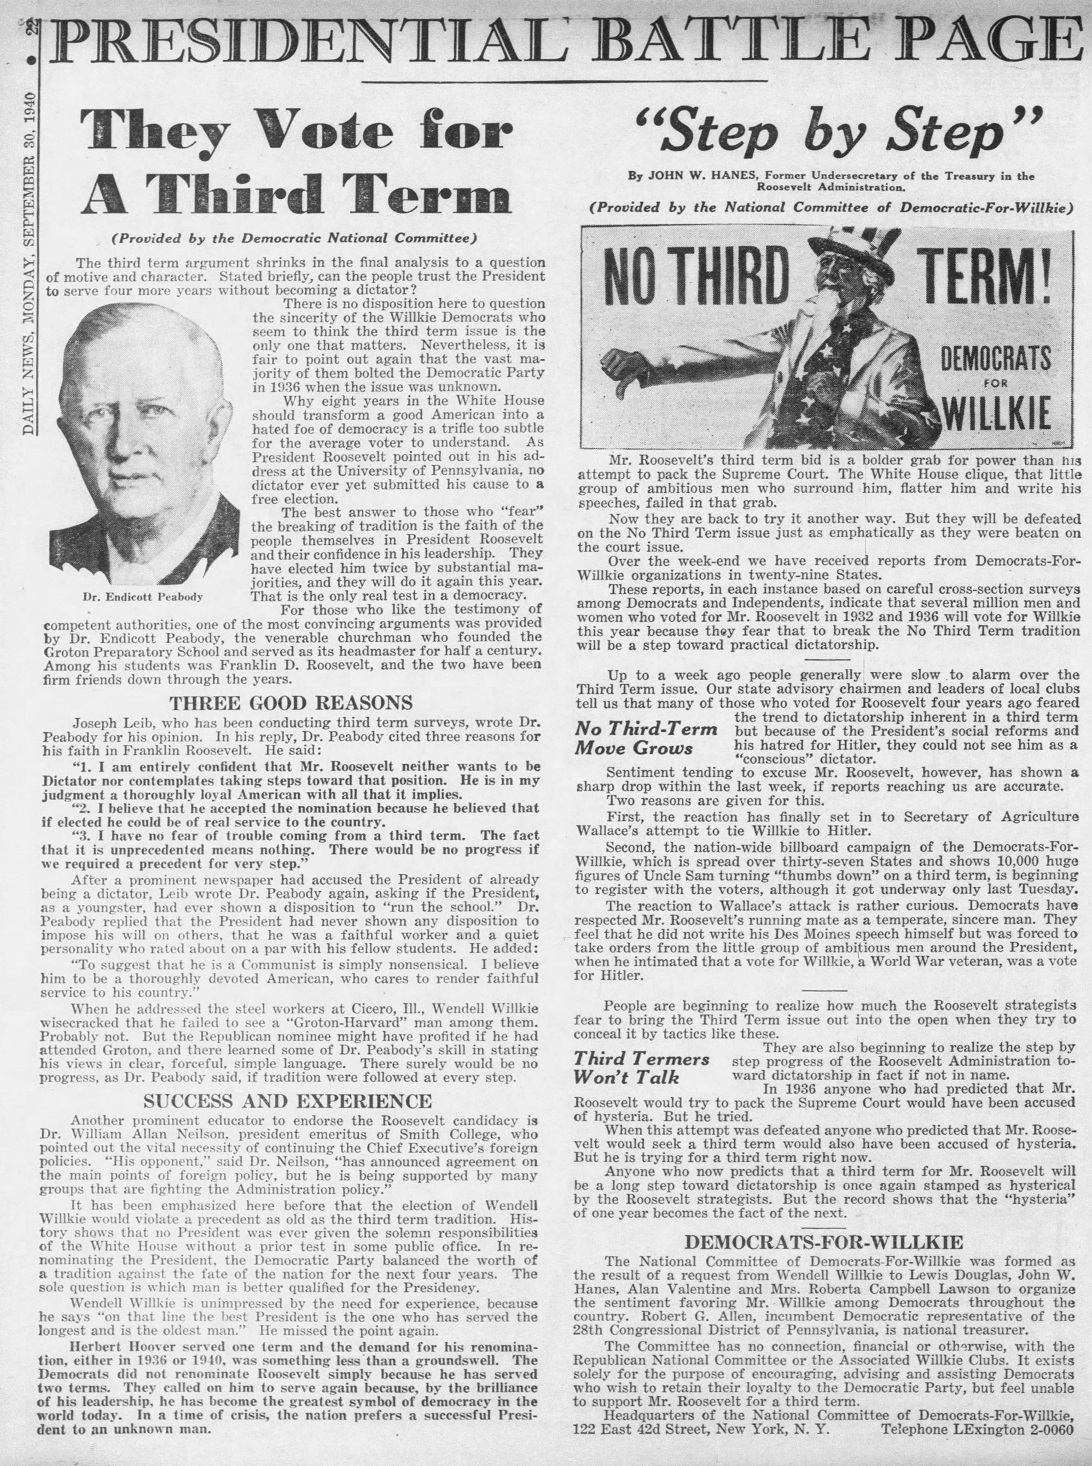 Daily_News_Mon__Sep_30__1940_(2).jpg